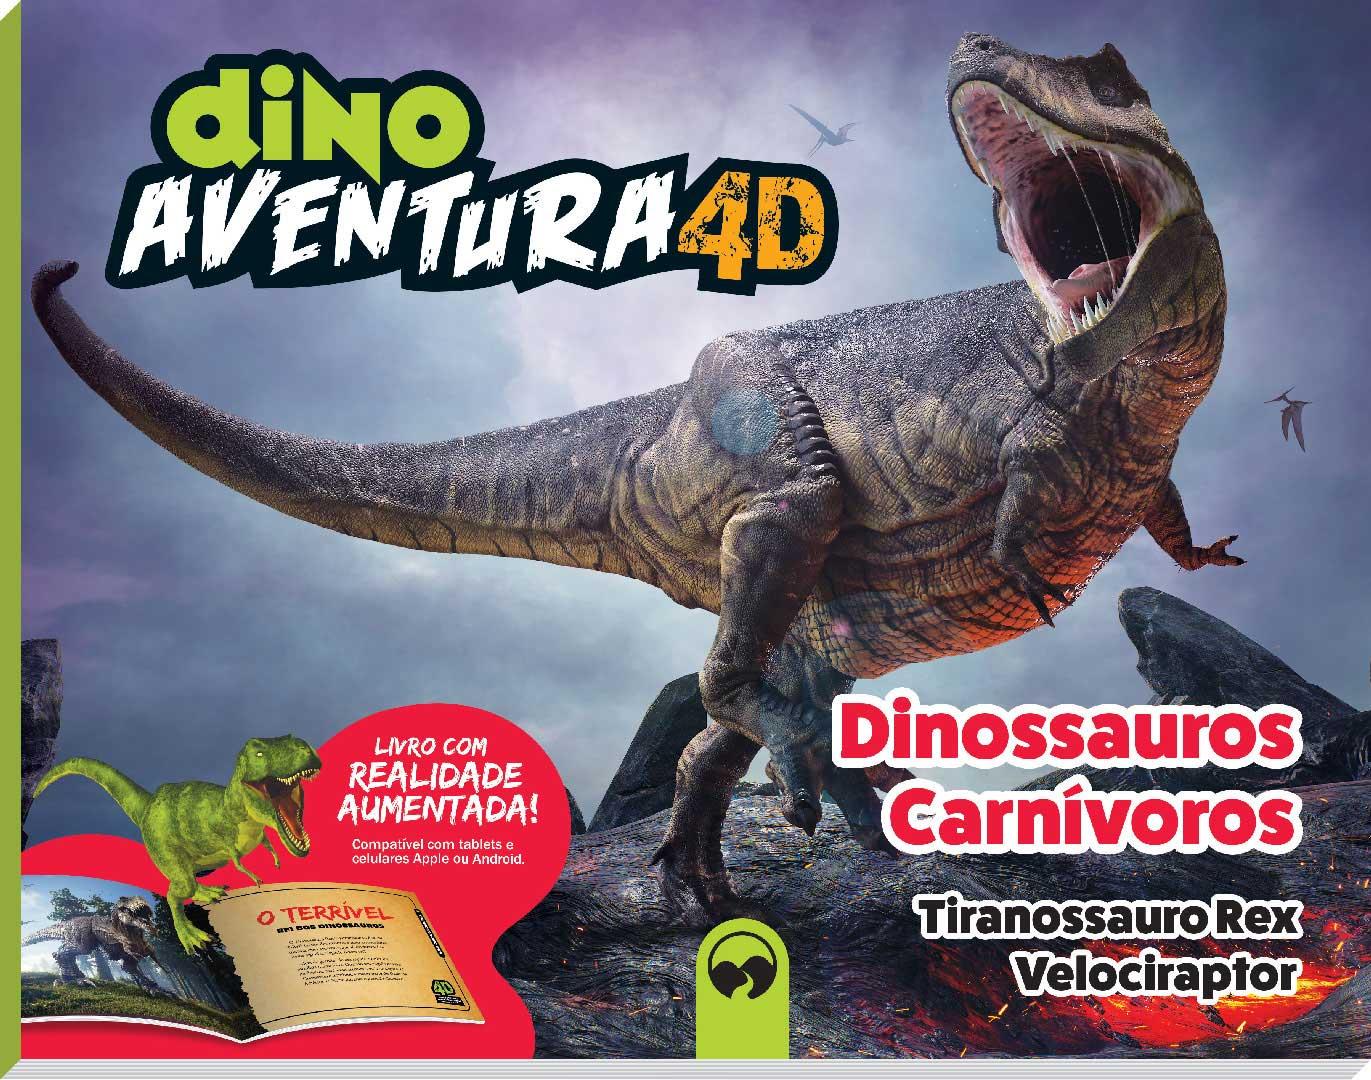 Dino Aventura 4D - Carnívoros